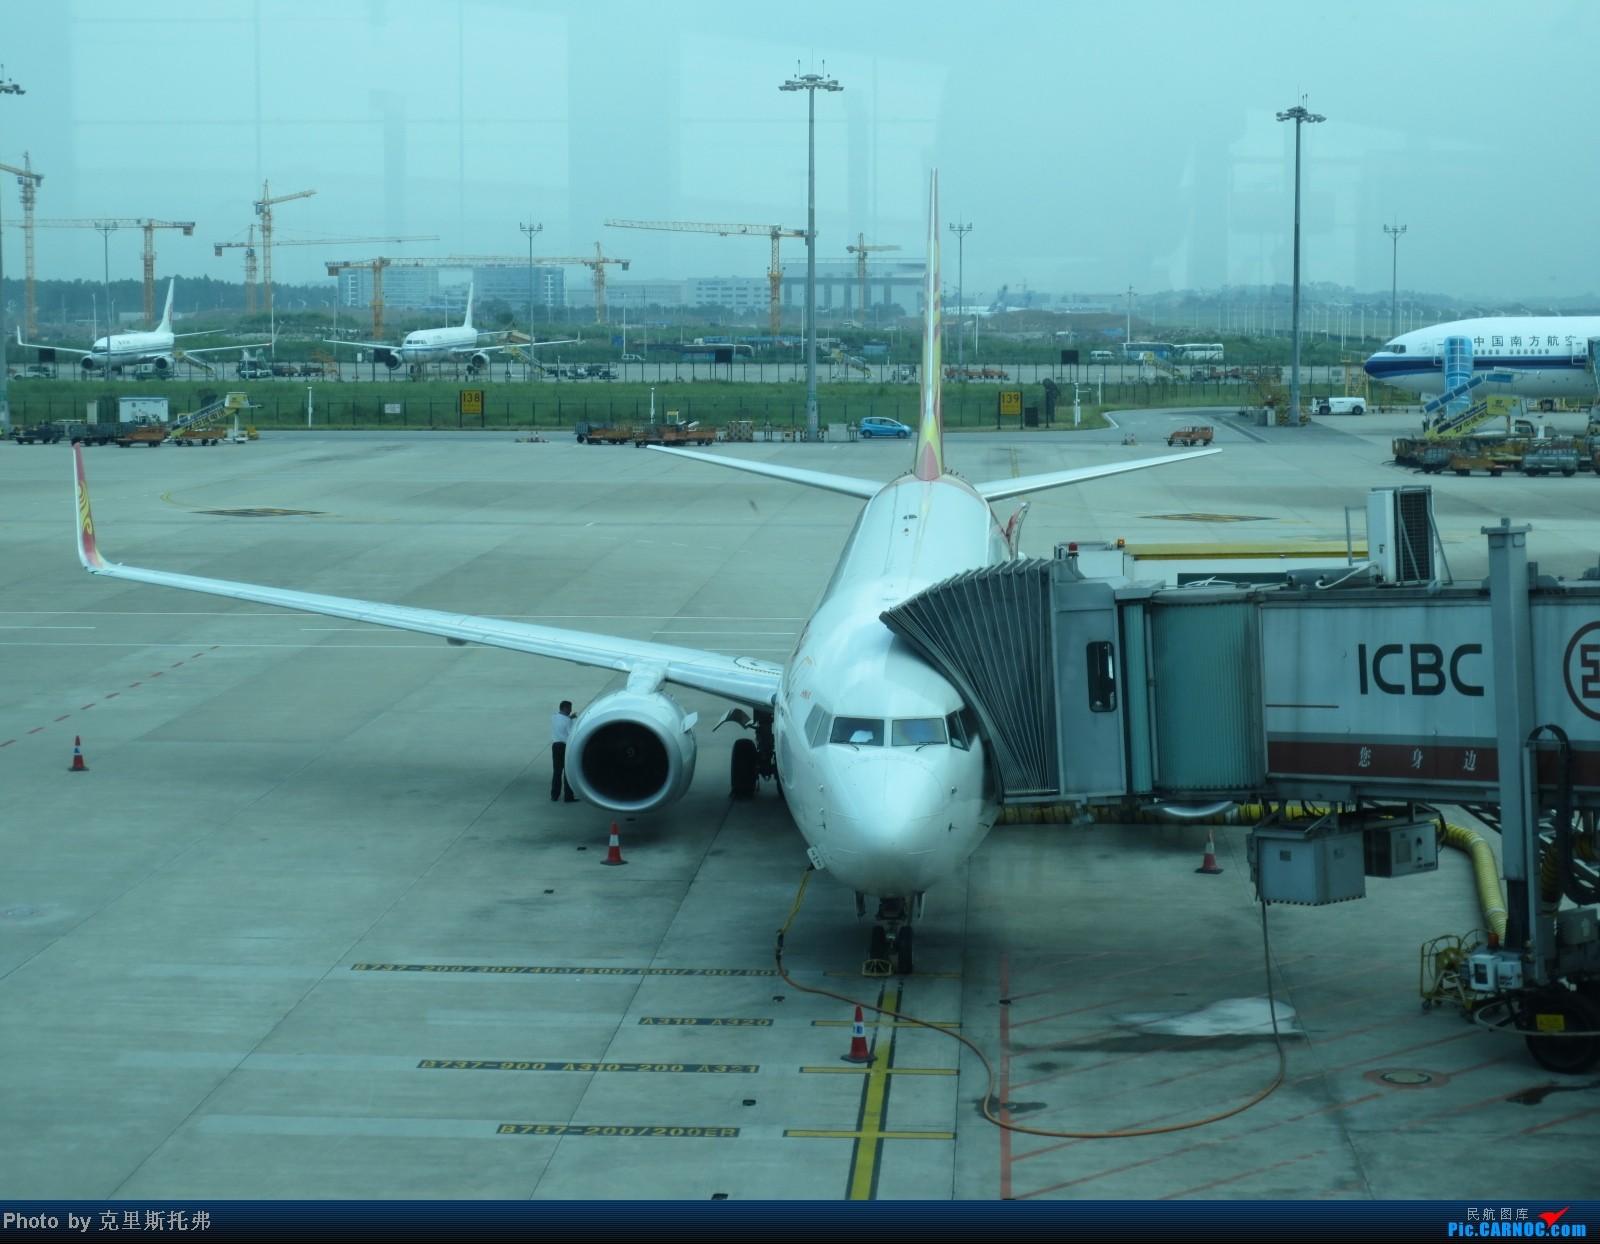 Re:[原创]【广州,你好!】八月齐鲁行 第一集 {初到齐鲁城} 不期而遇,鹏程行万里 相伴相惜,享飞行至美 737-800